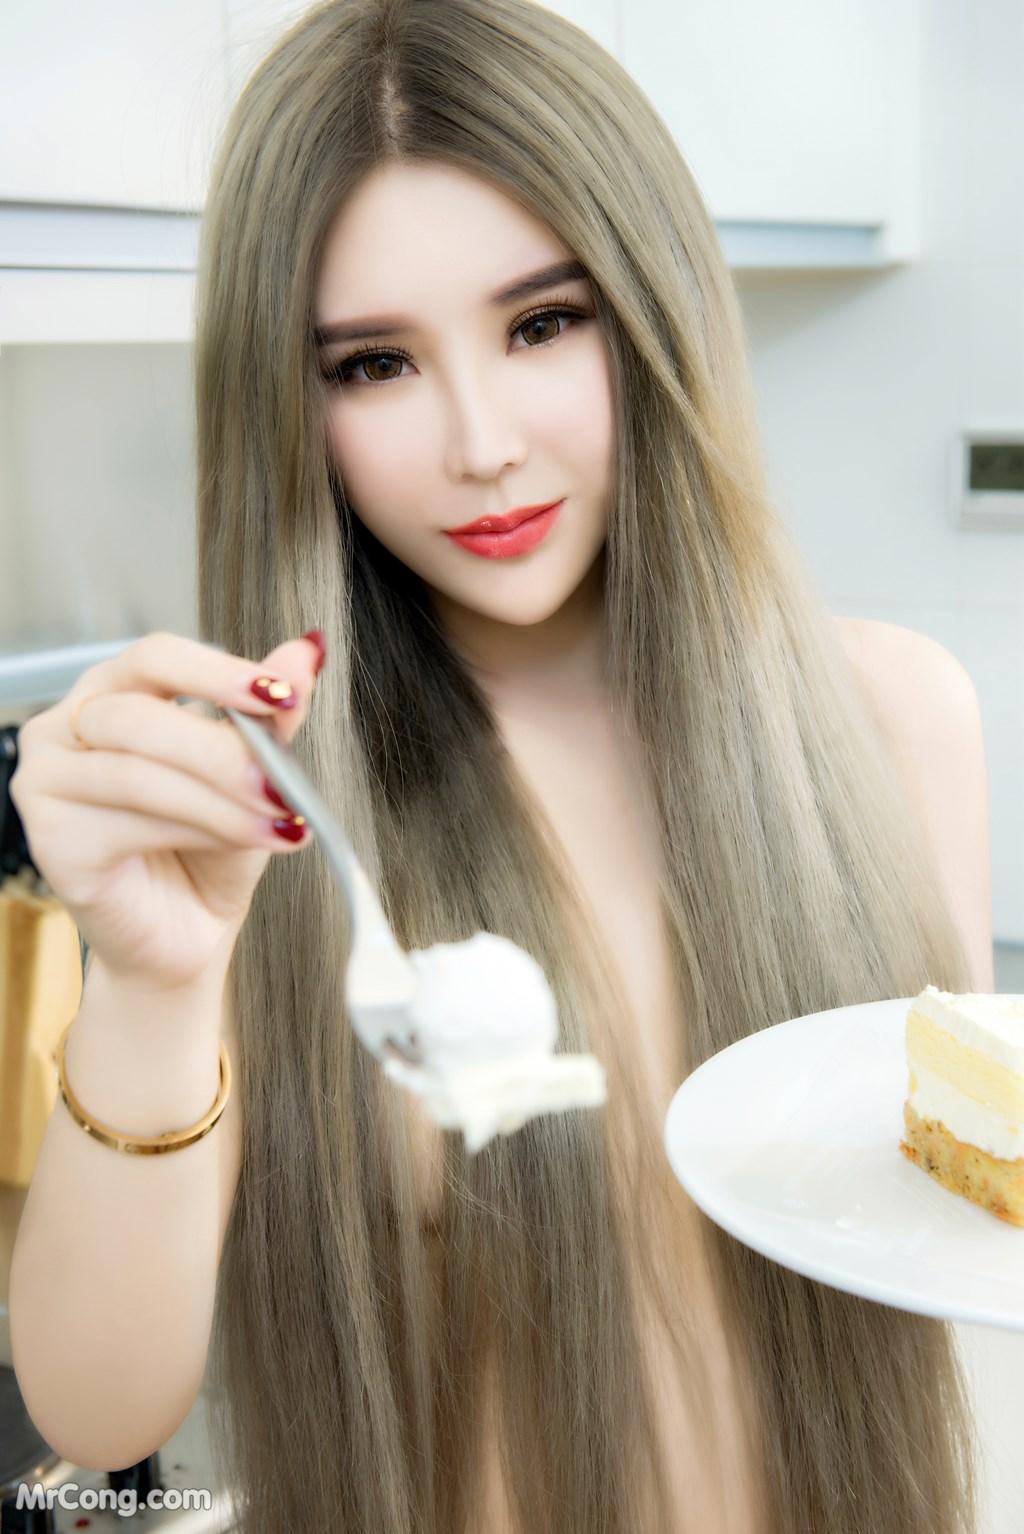 Image SLADY-2017-05-25-No.009-Lisa-Aili-Sha-MrCong.com-007 in post SLADY 2017-05-25 No.009: Người mẫu Lisa (爱丽莎) (58 ảnh)